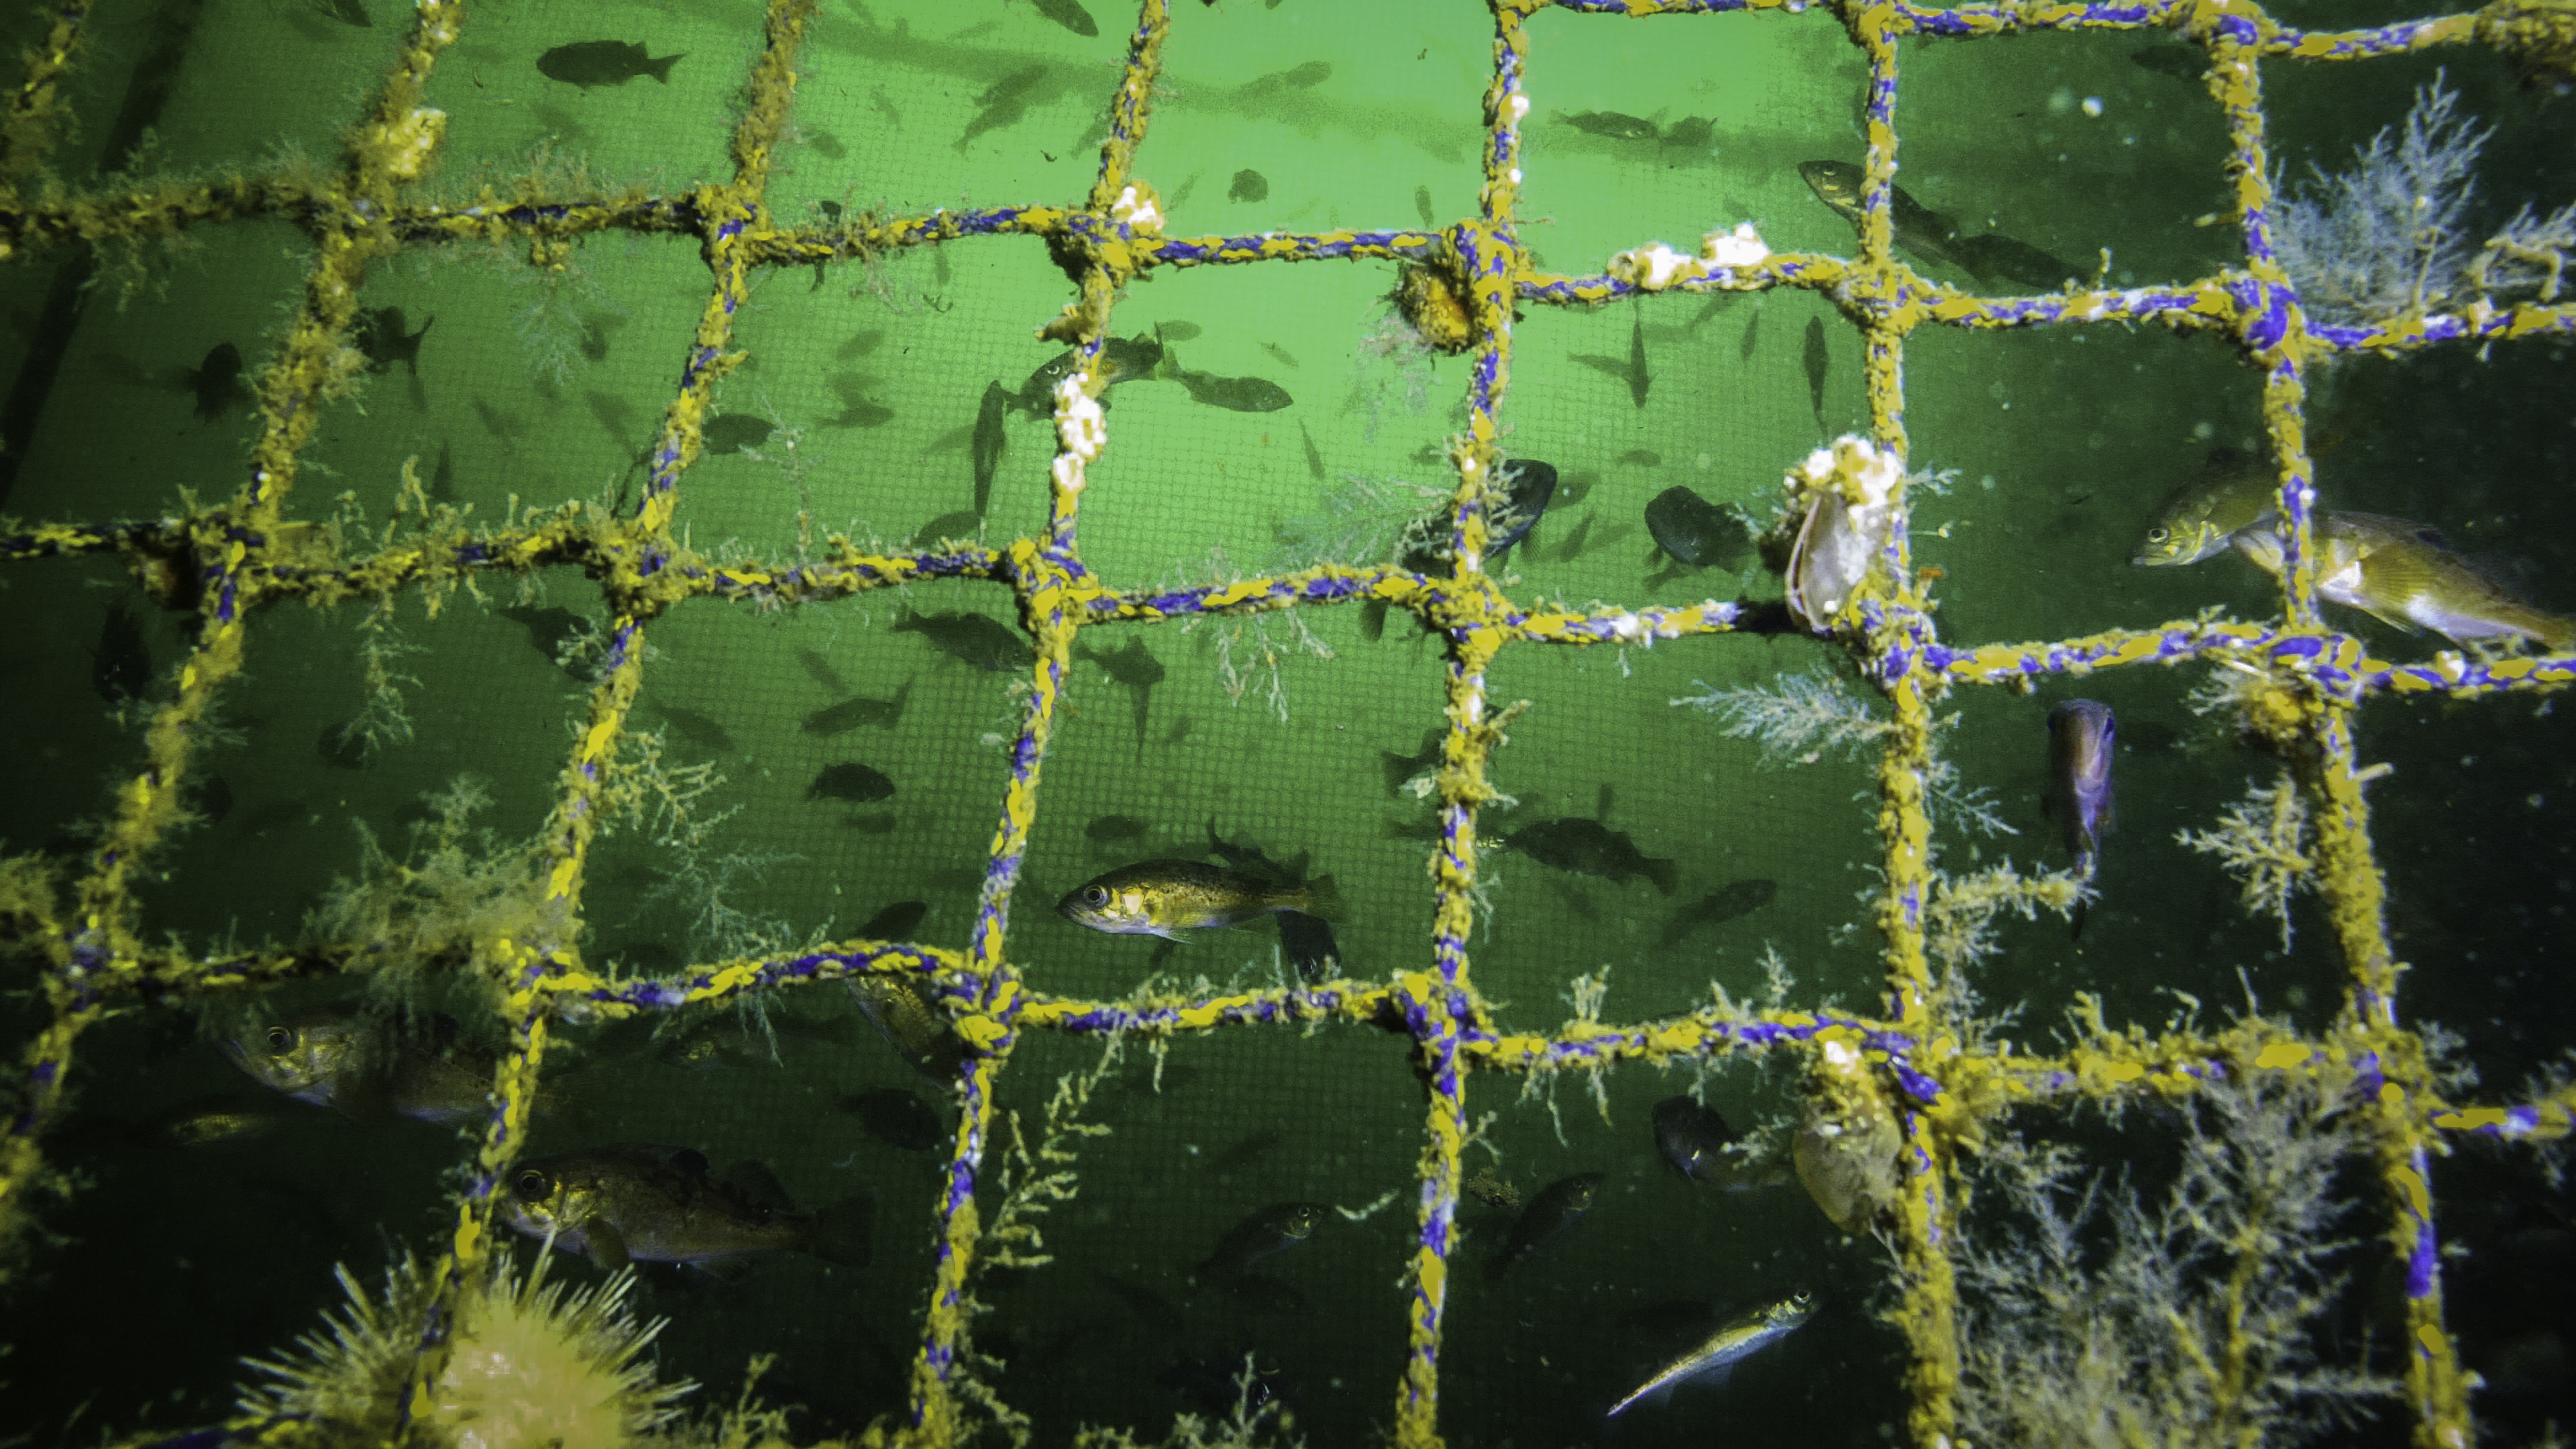 170817-SA-Schooling-wild-fish-bathe-and-feast-on-the-pathogen-loaded-feces-of-farmed-Atlantic-salmon